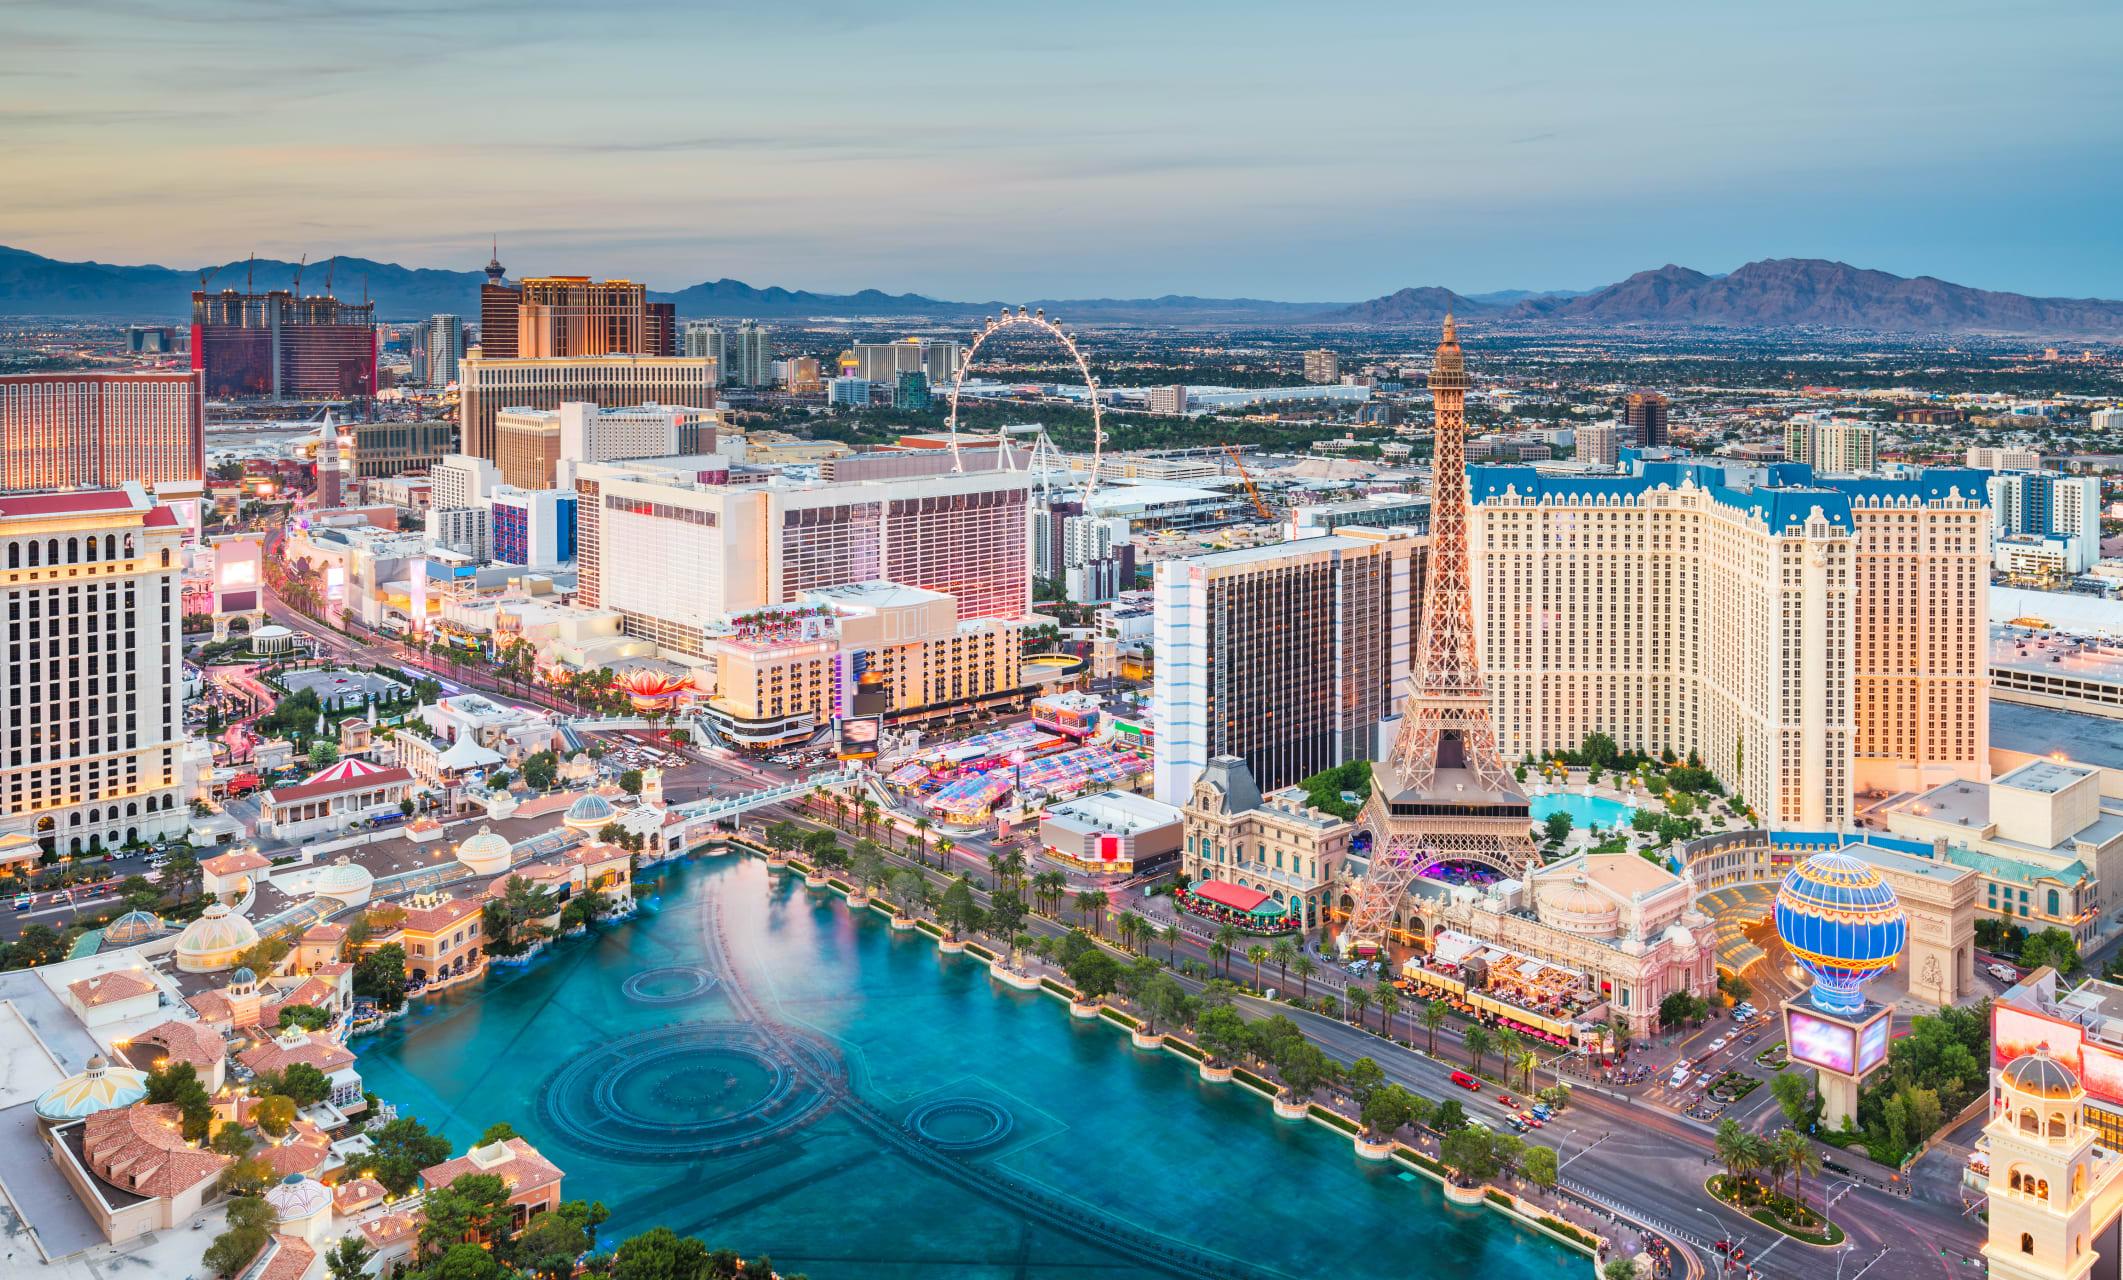 Las Vegas - Modern Las Vegas: Spectacles on the Strip